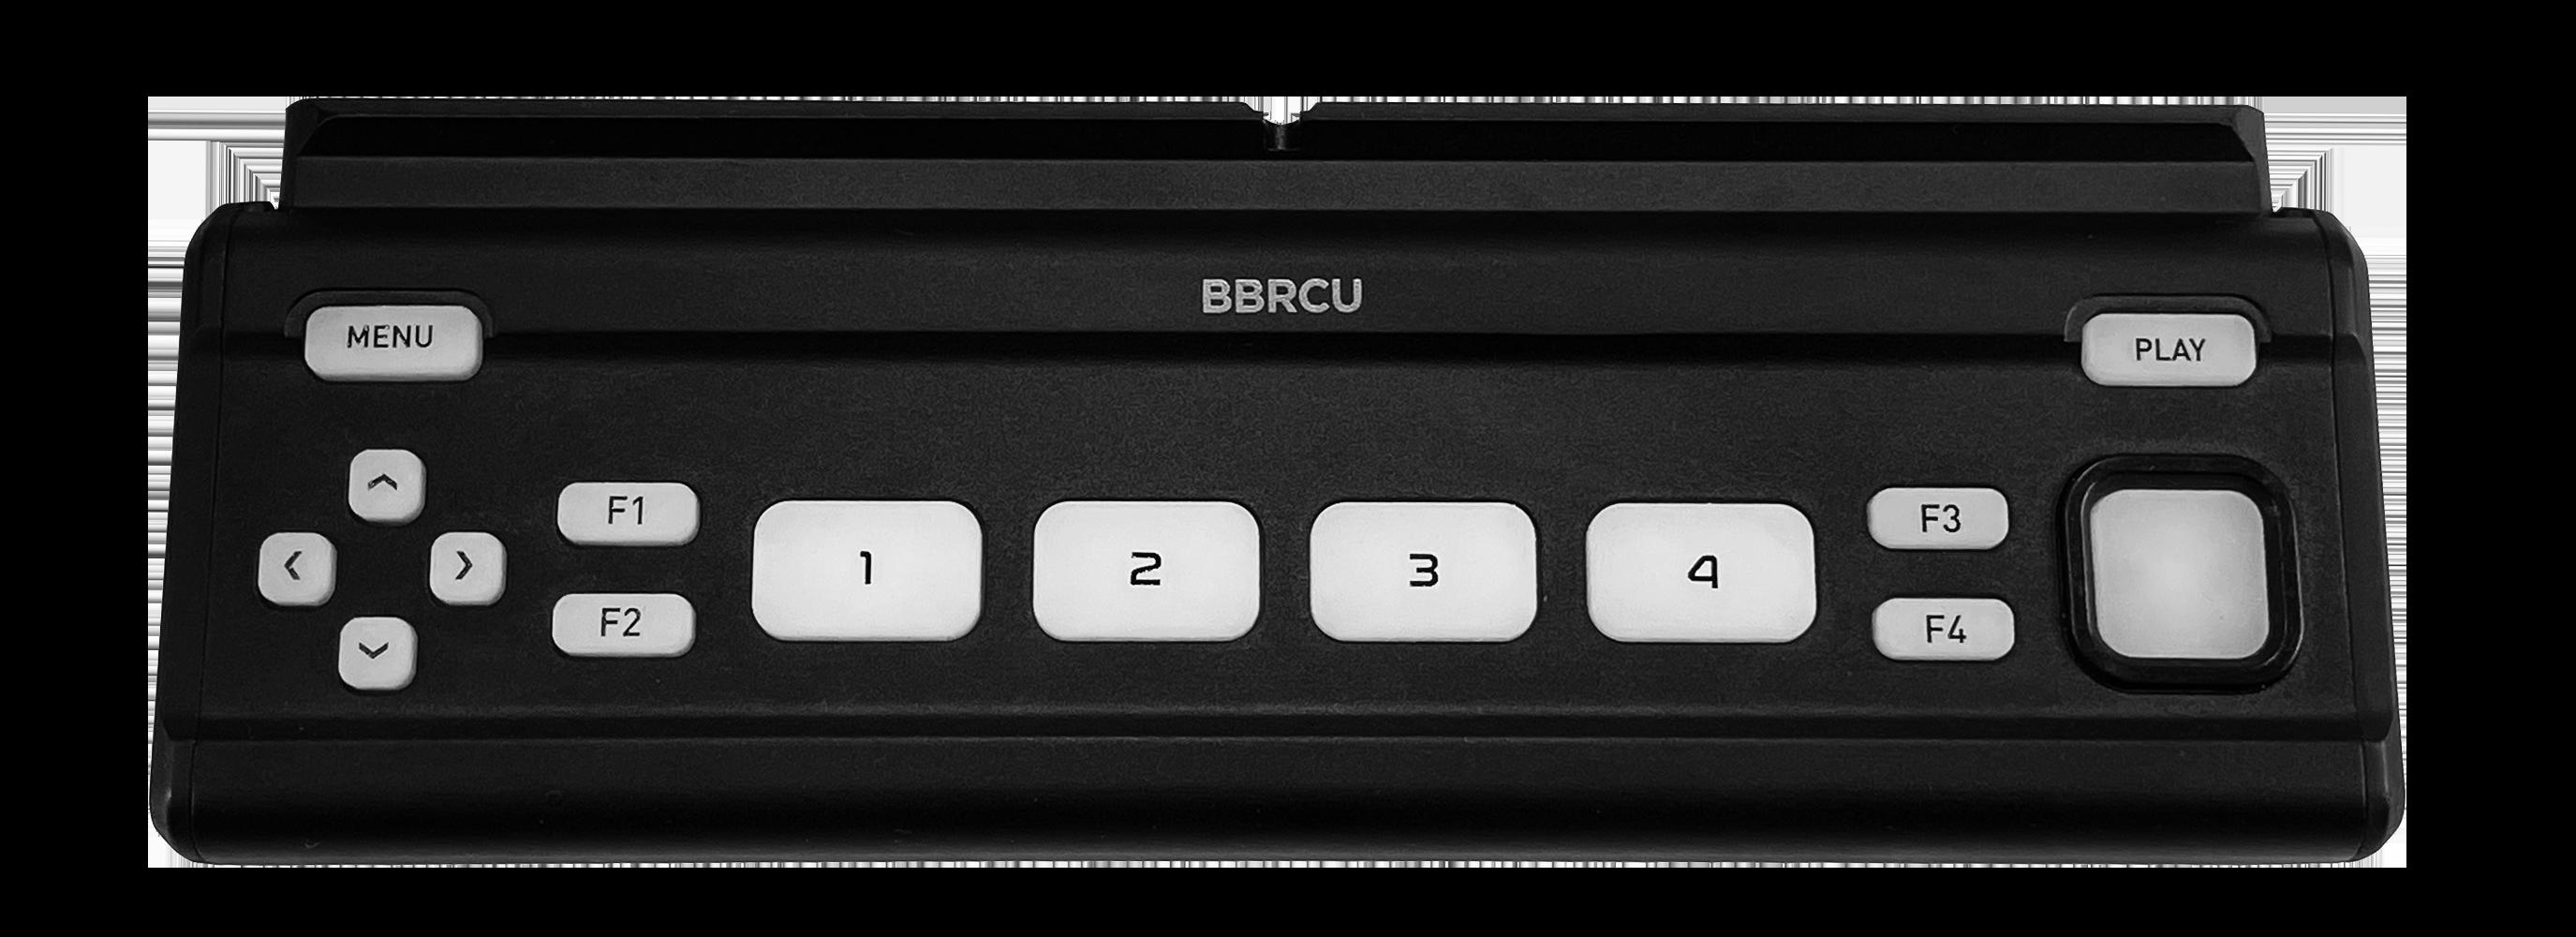 BBRCU - Button Bar Remote Control Unit